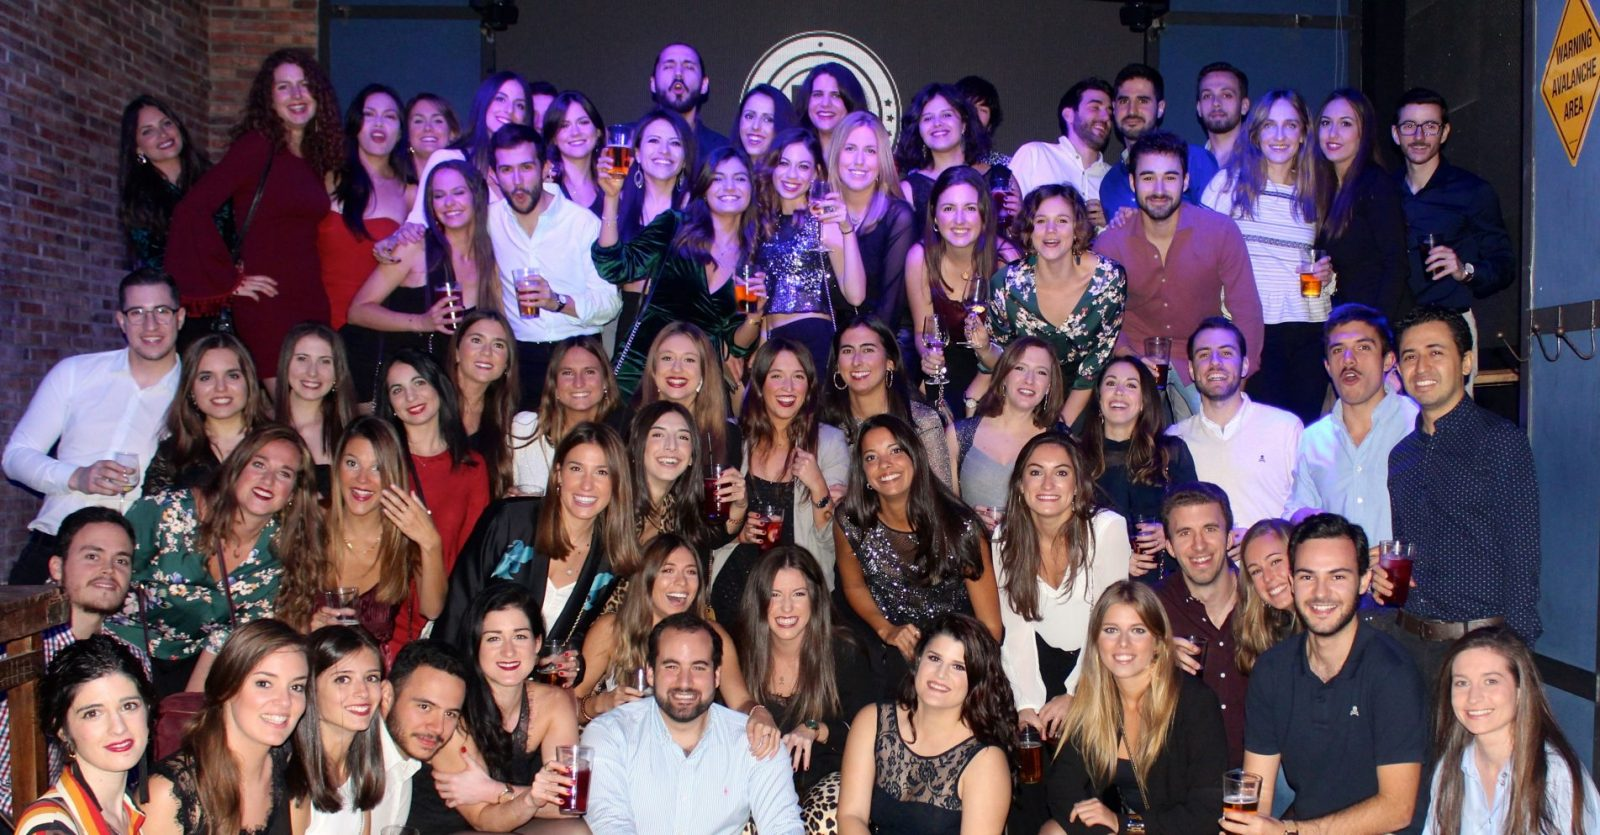 Fiesta residentes 2018 Social Eventos-Foto de grupo